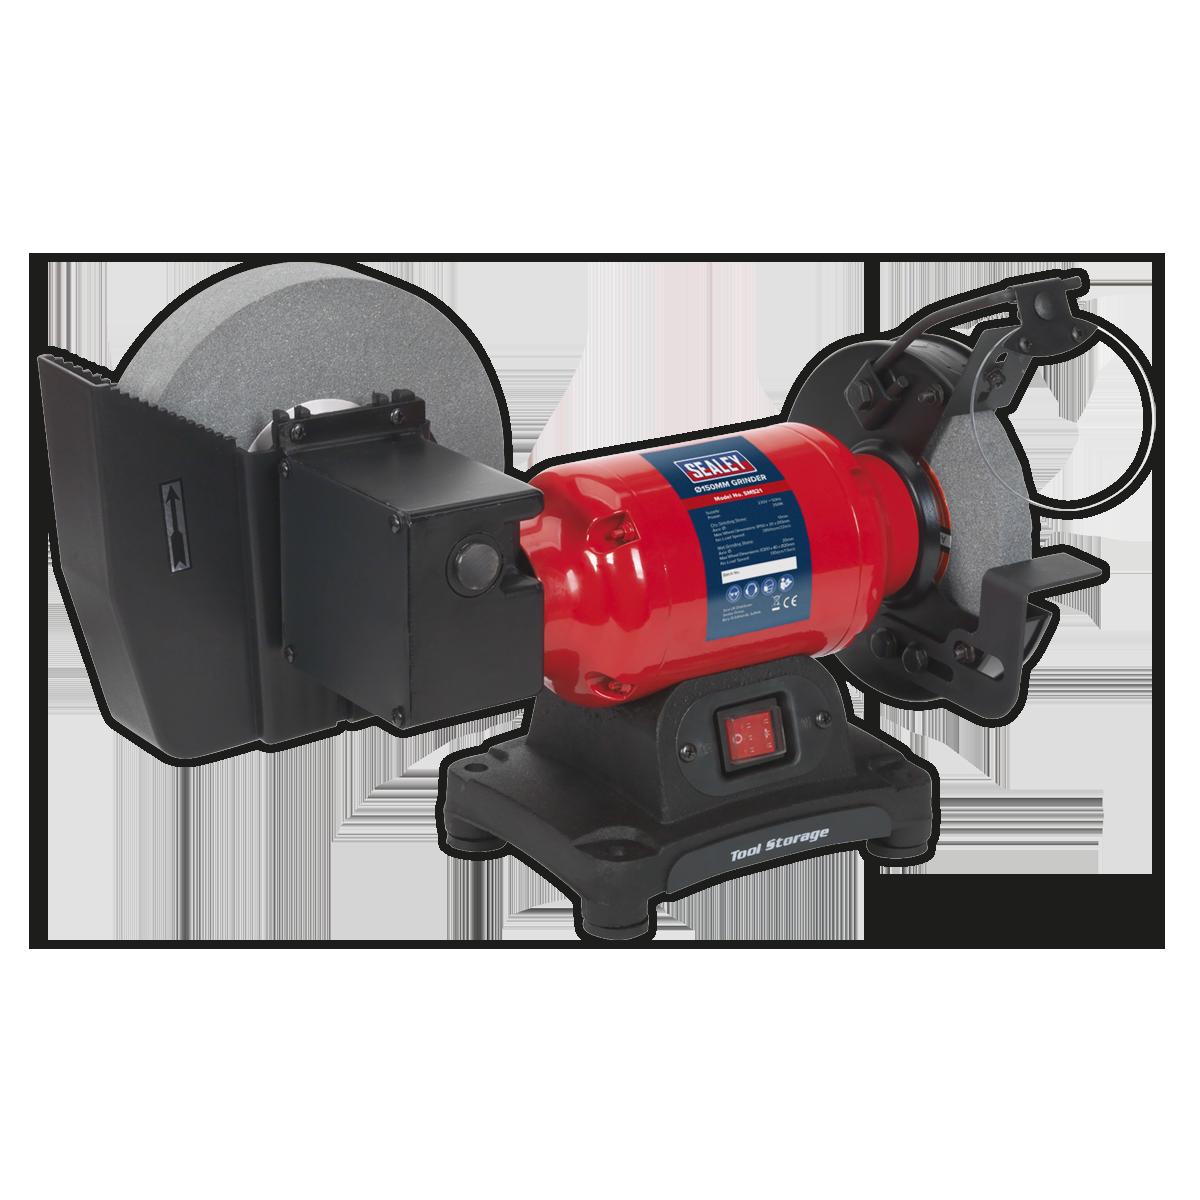 Bench Grinder Wet Dry O200 150mm 250w 230v Sealey Sm521 By Sealey 5057719082839 Ebay